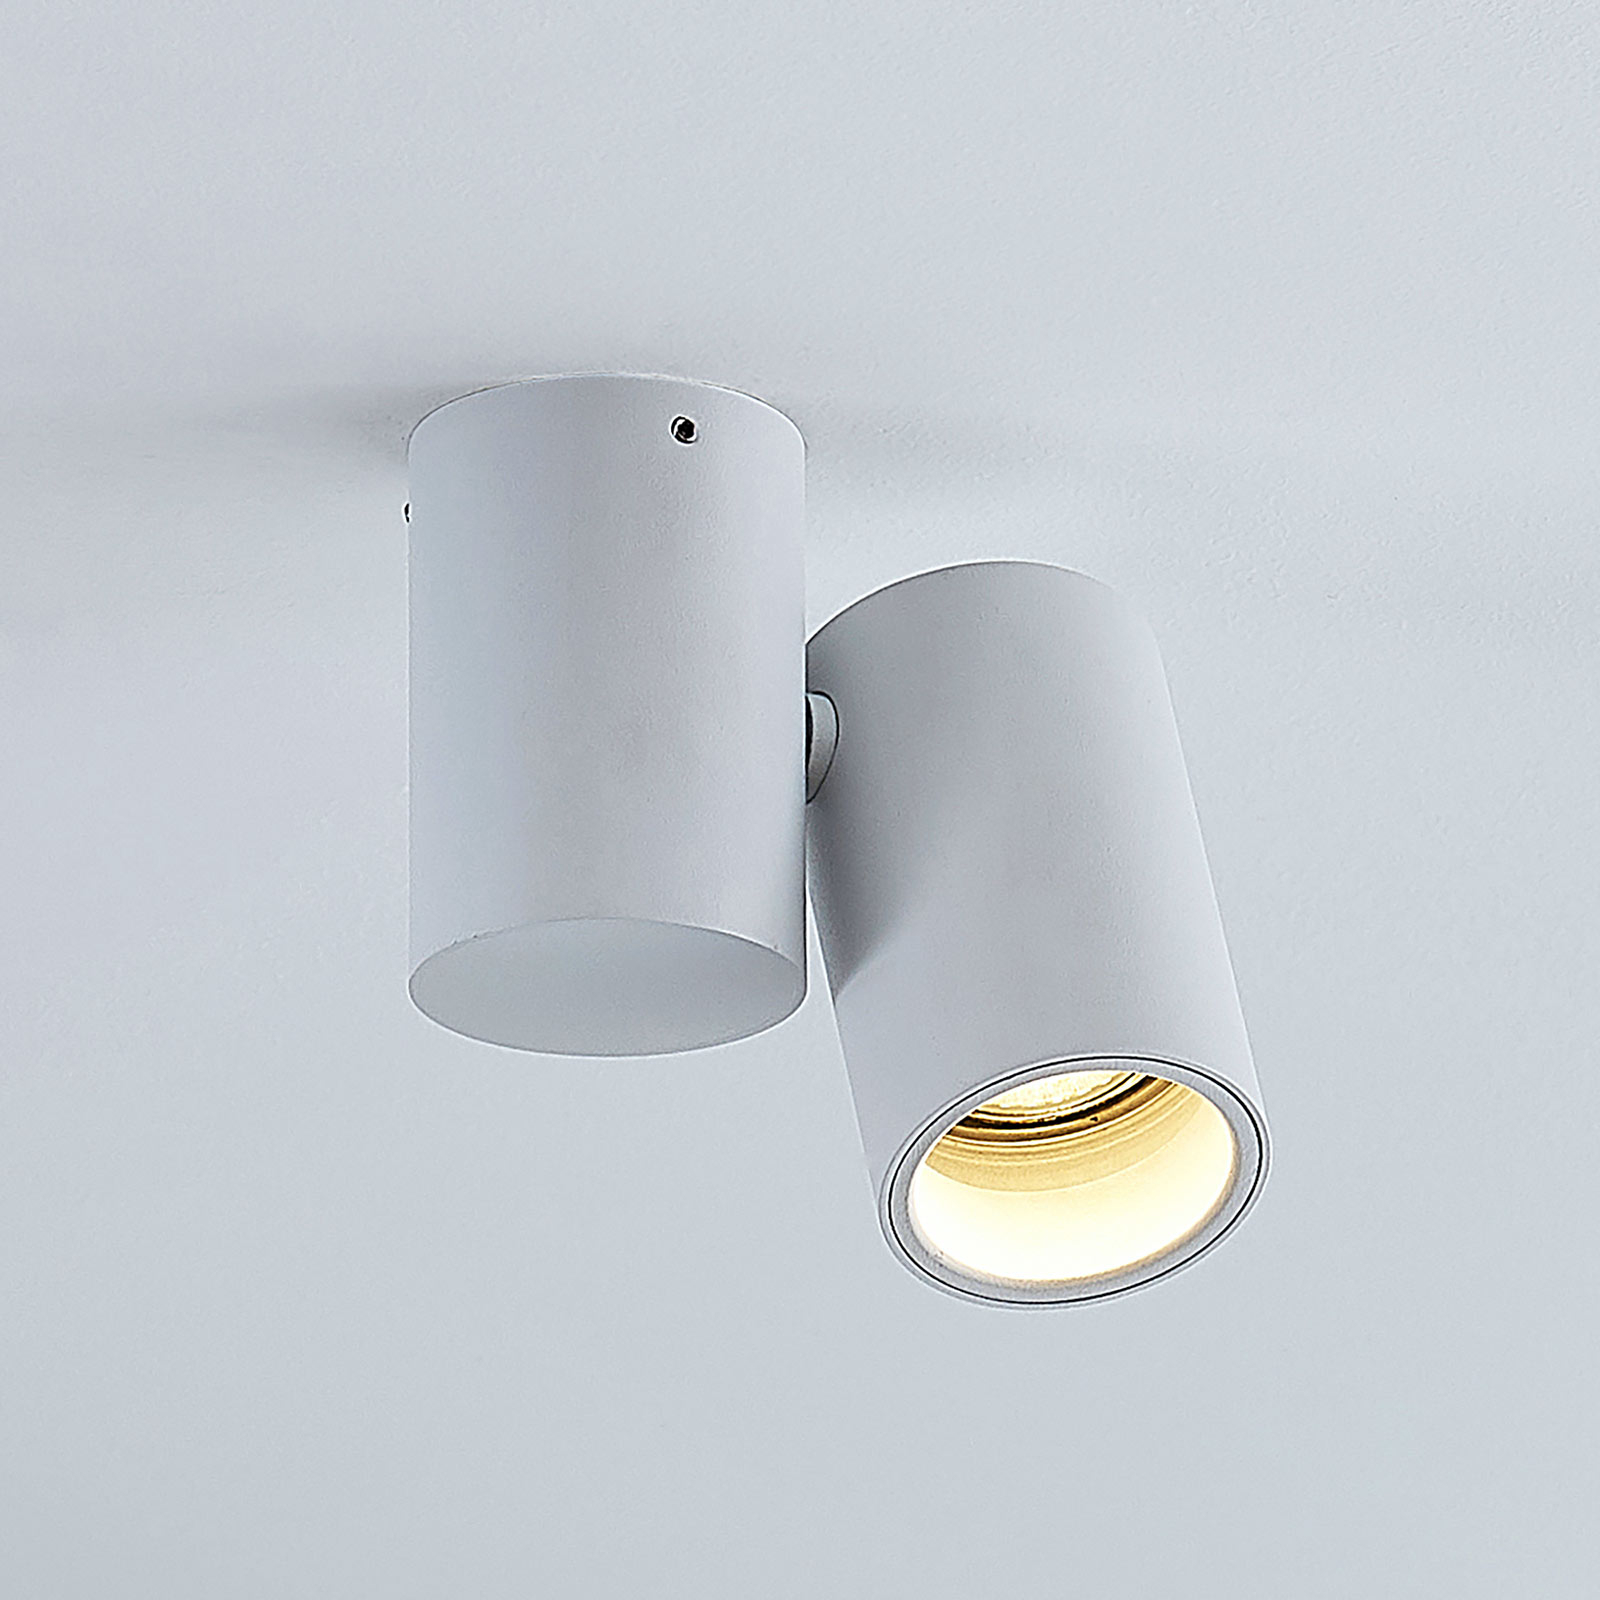 Taklampa Gesina, 1 lampa, vit